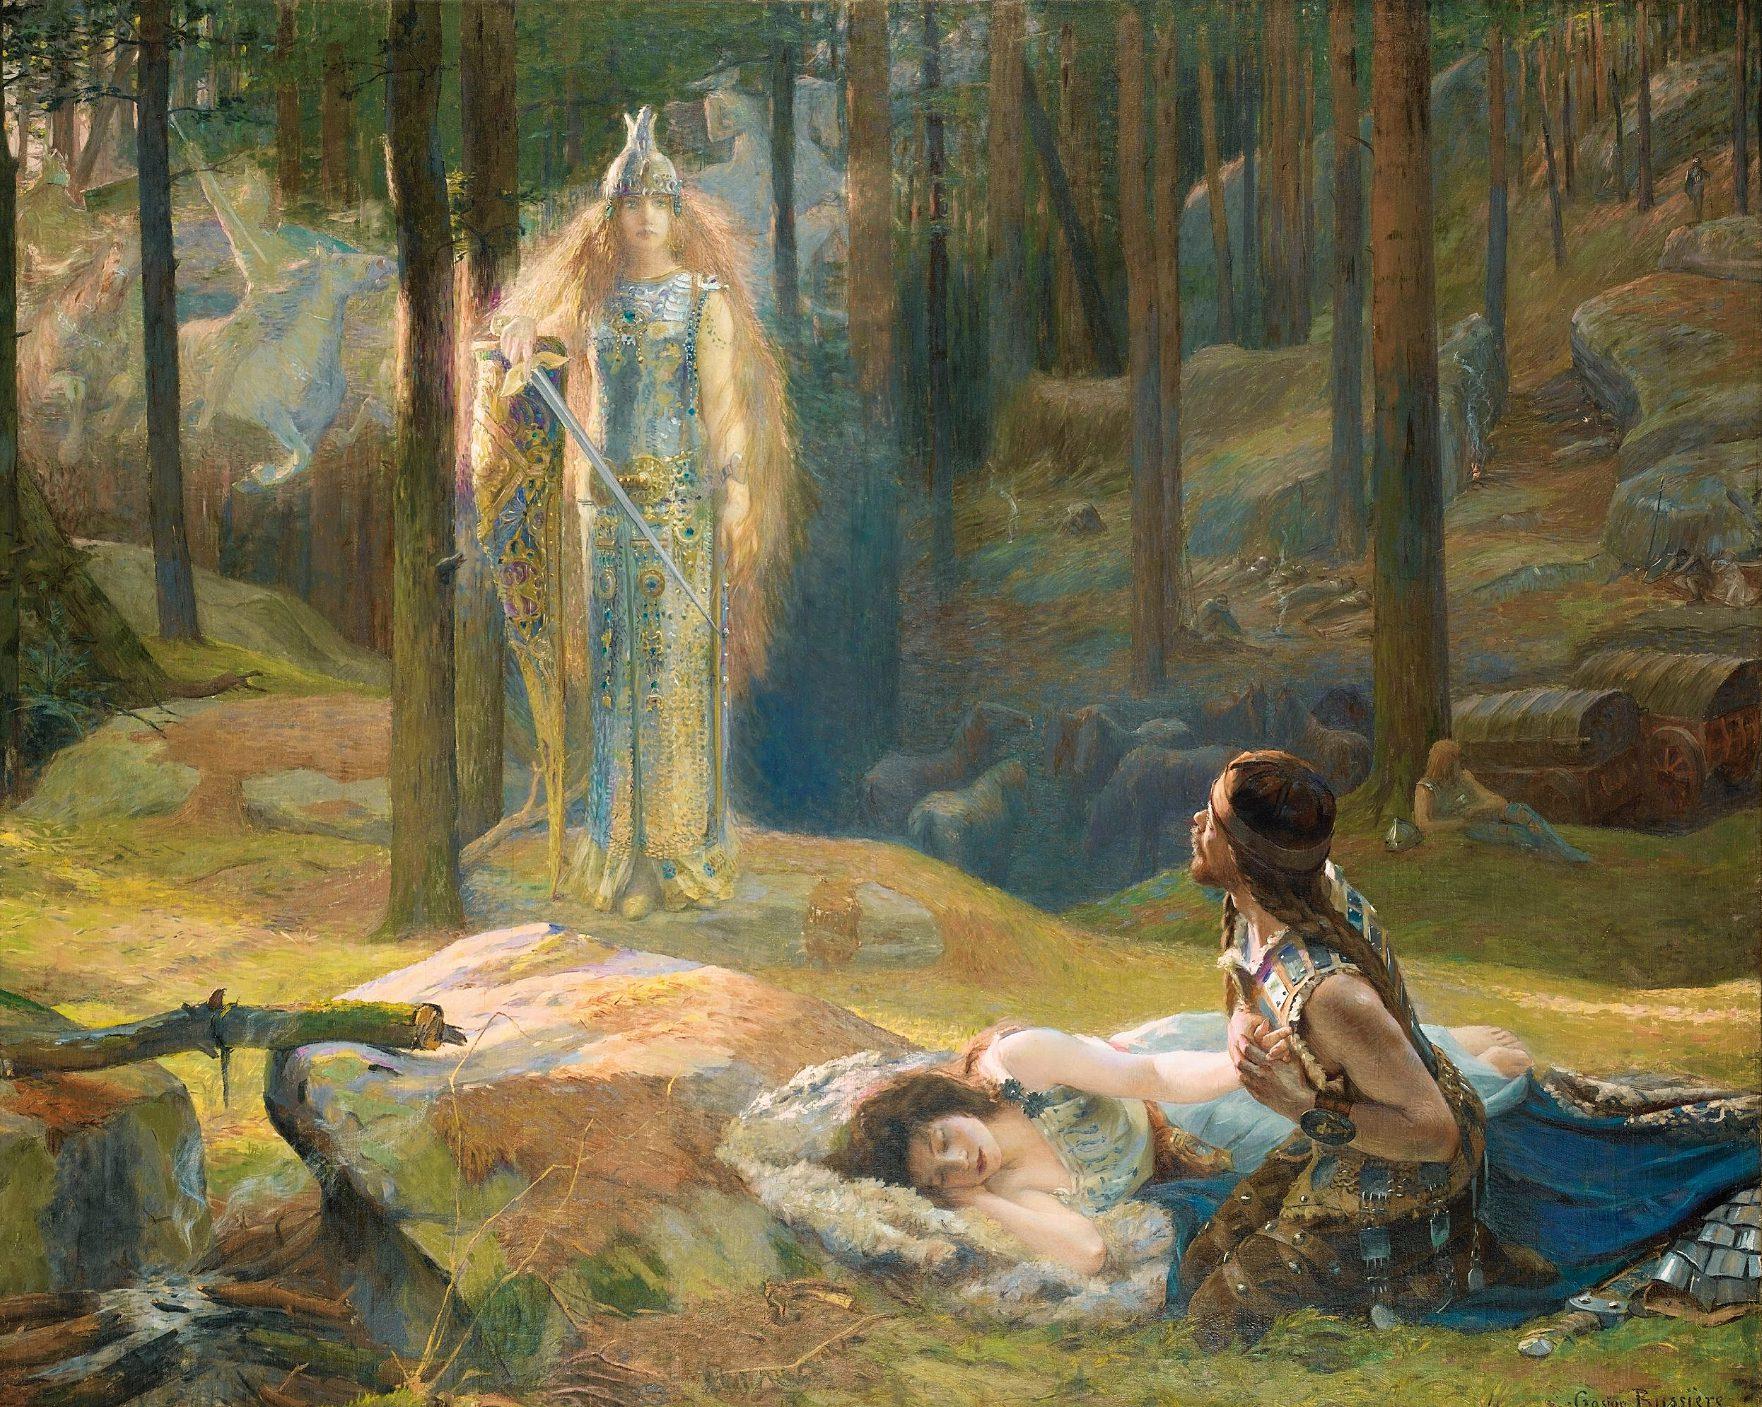 Viking women of the Viking Age